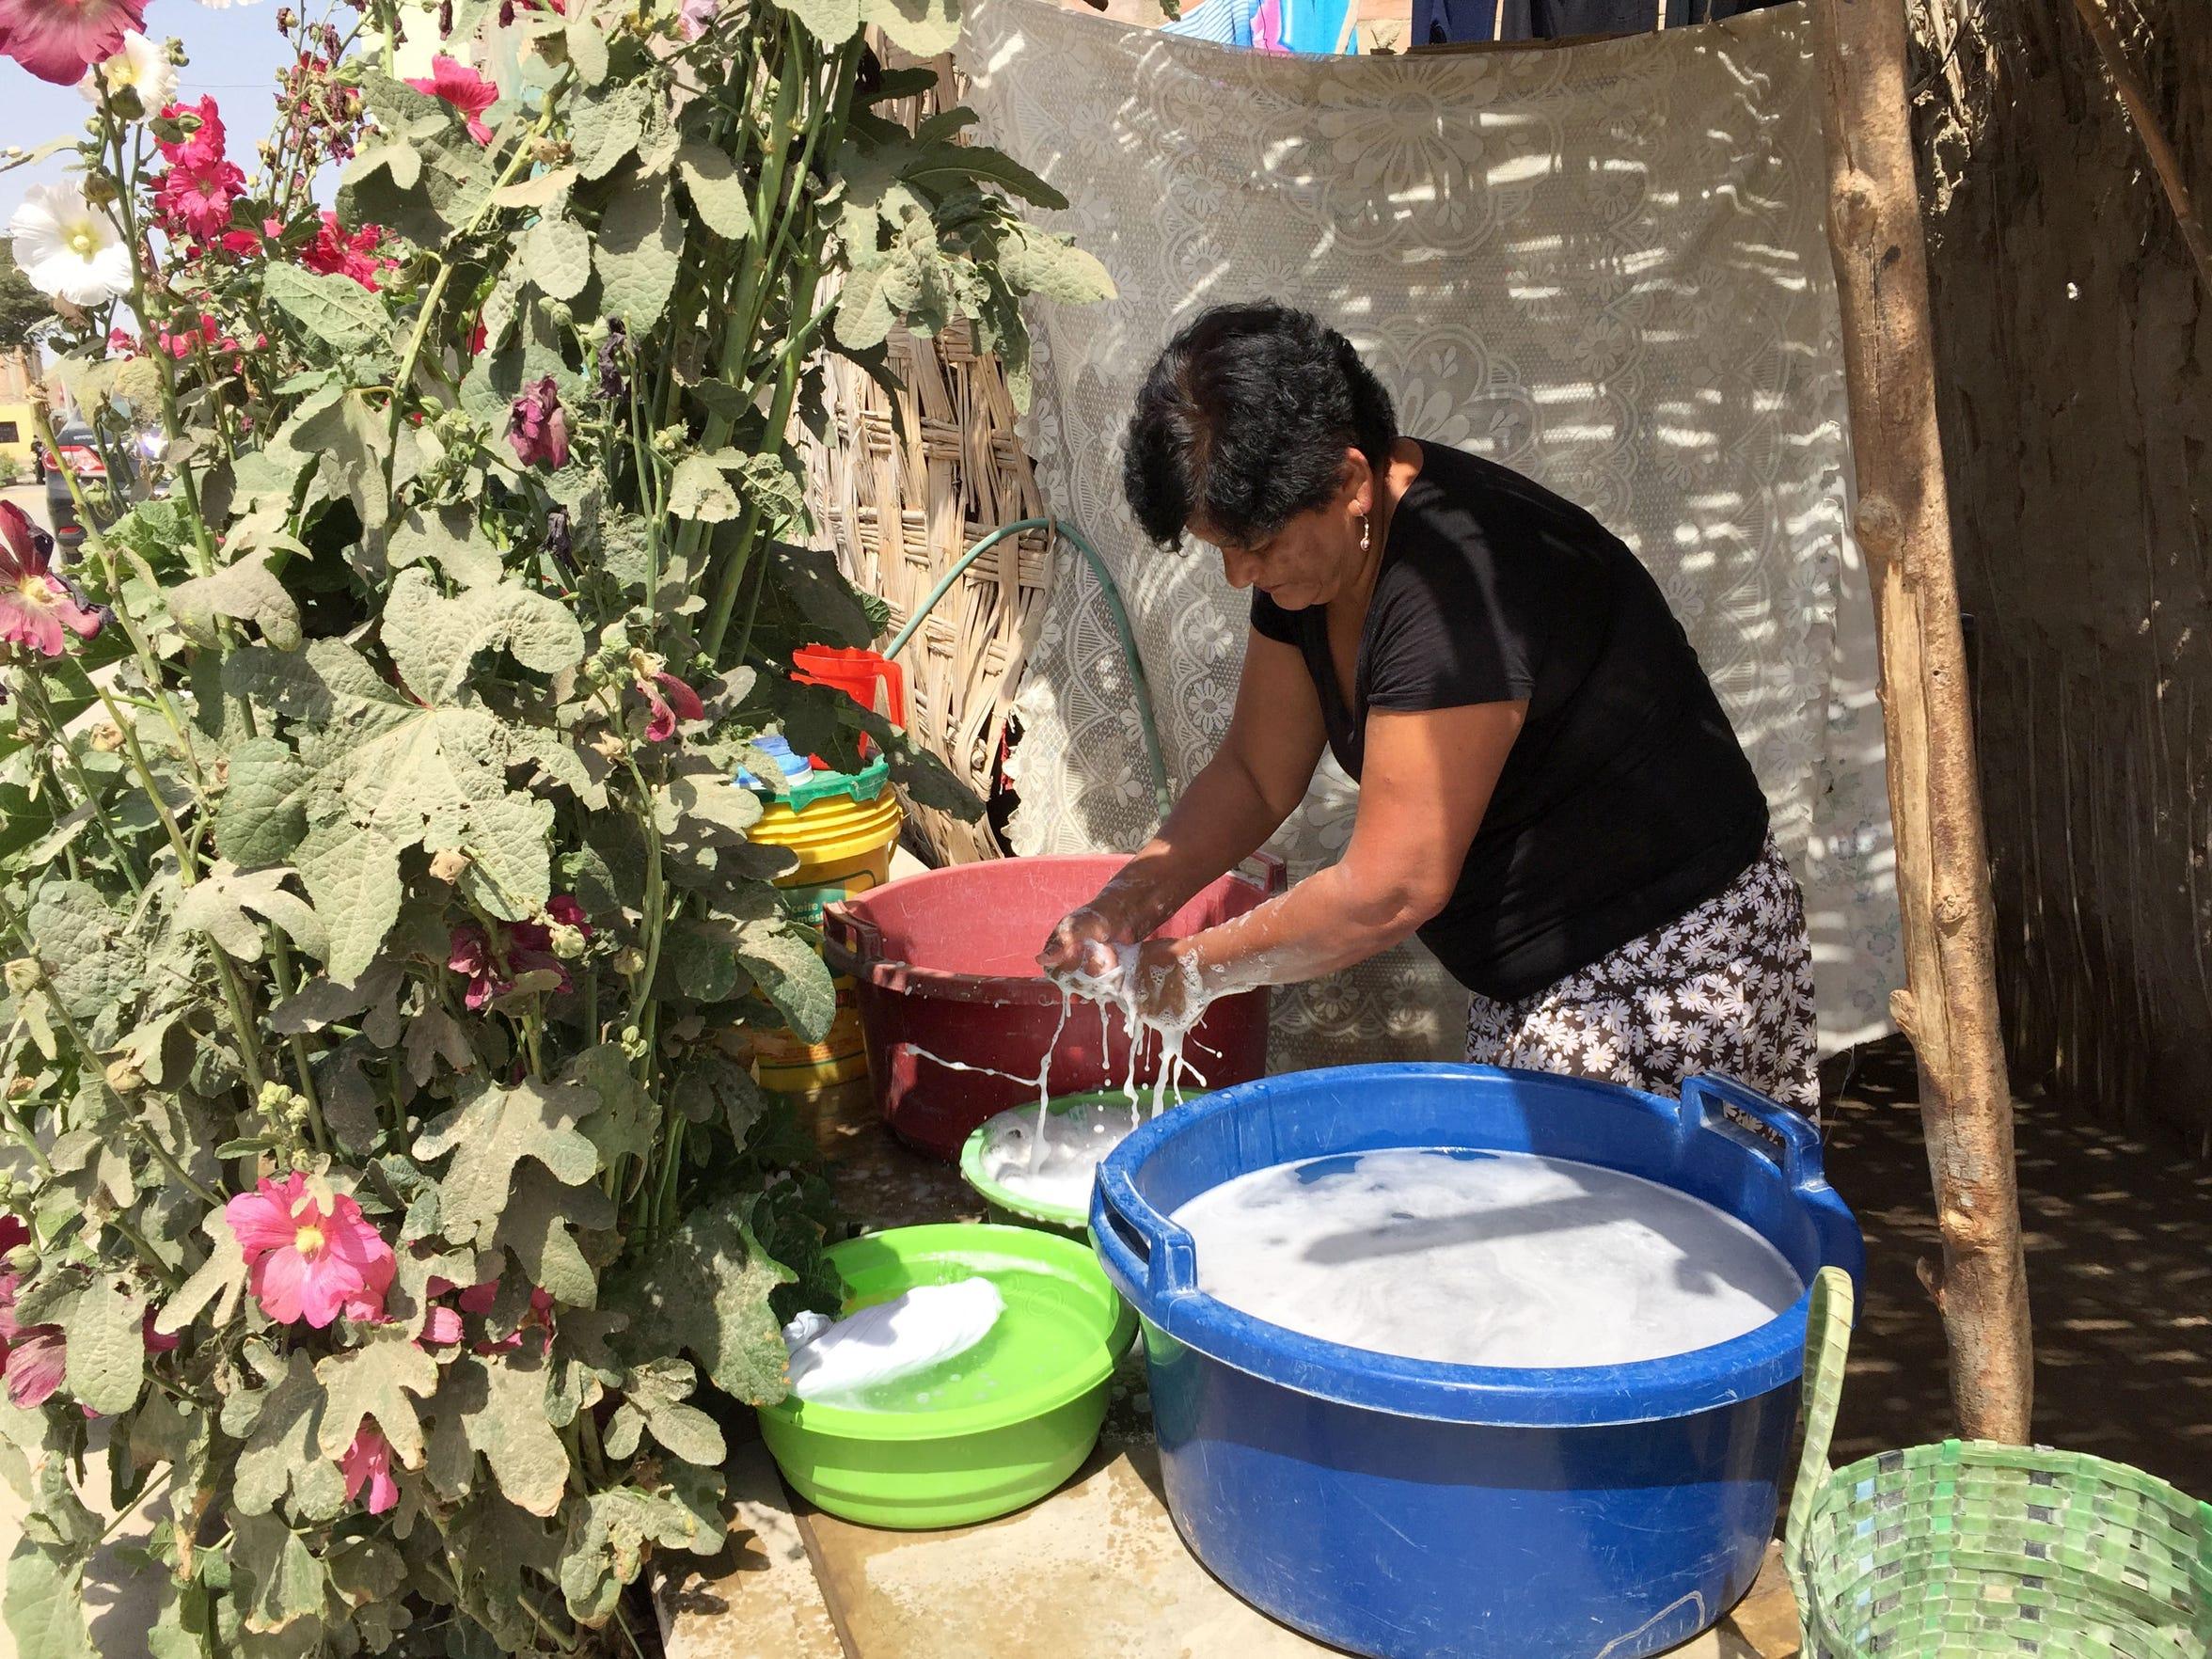 08102015 -- Ica, Peru --Farmworker Jesús Natividad